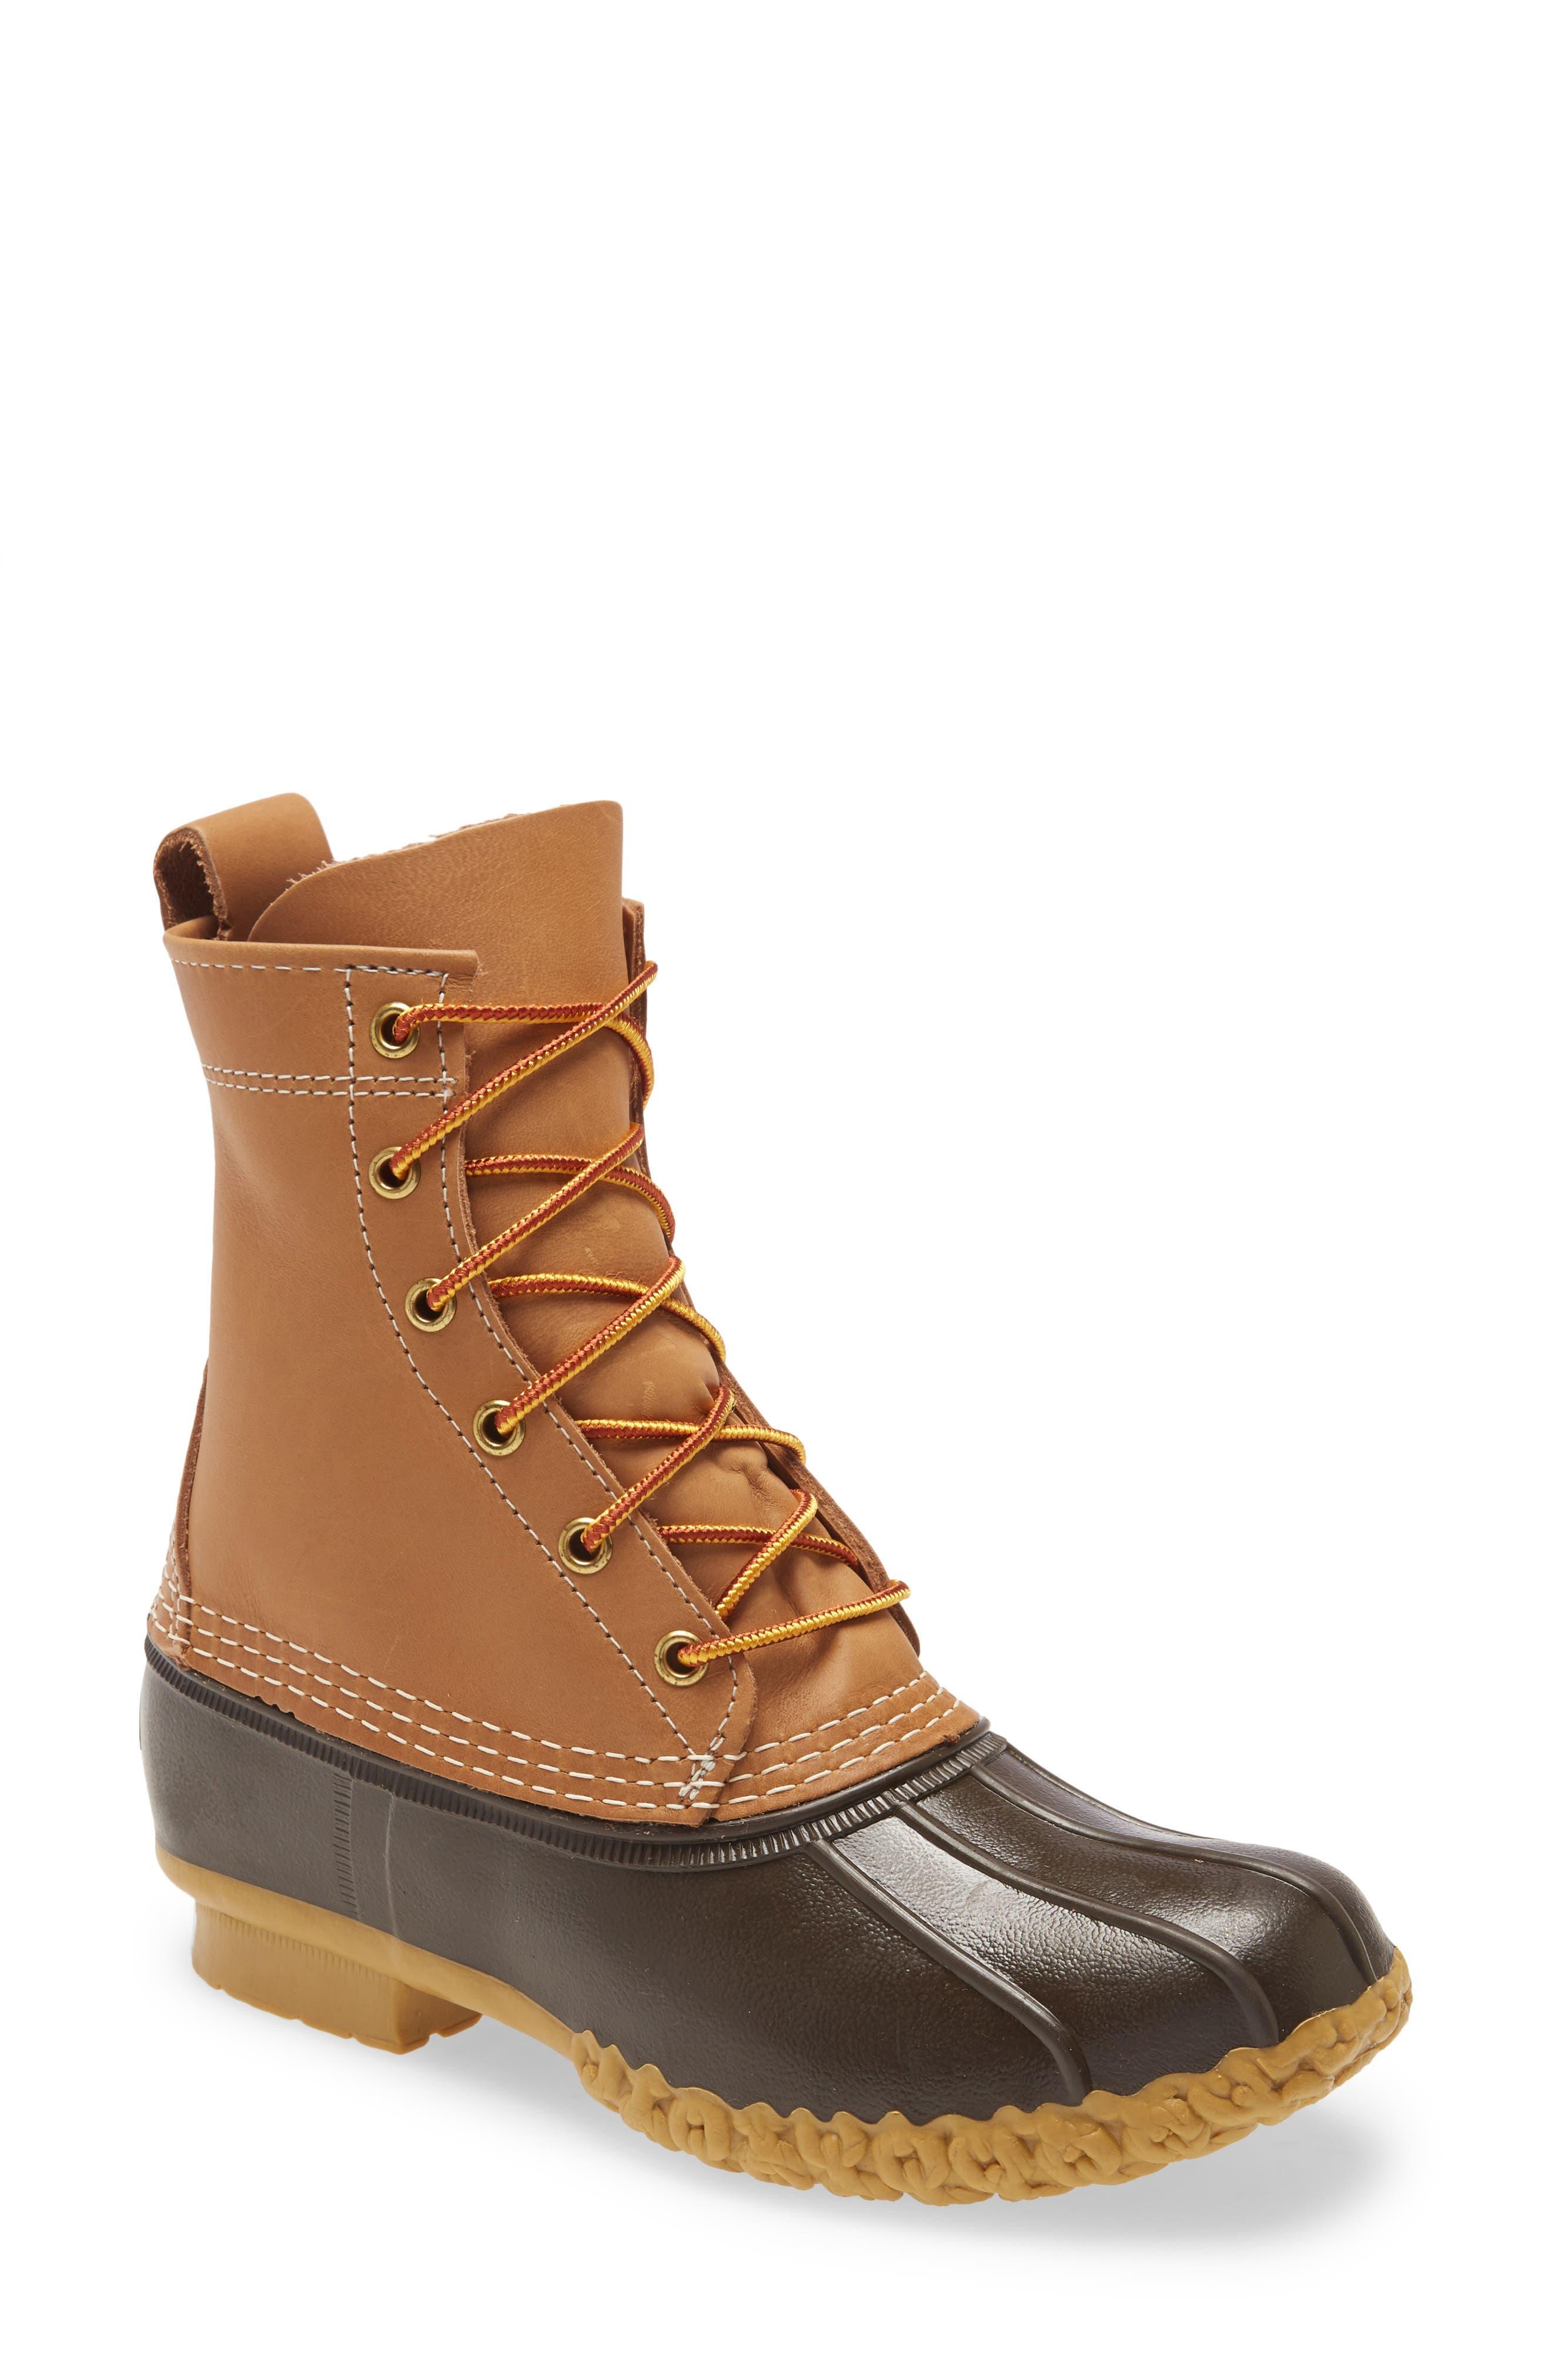 8-Inch Bean Boot